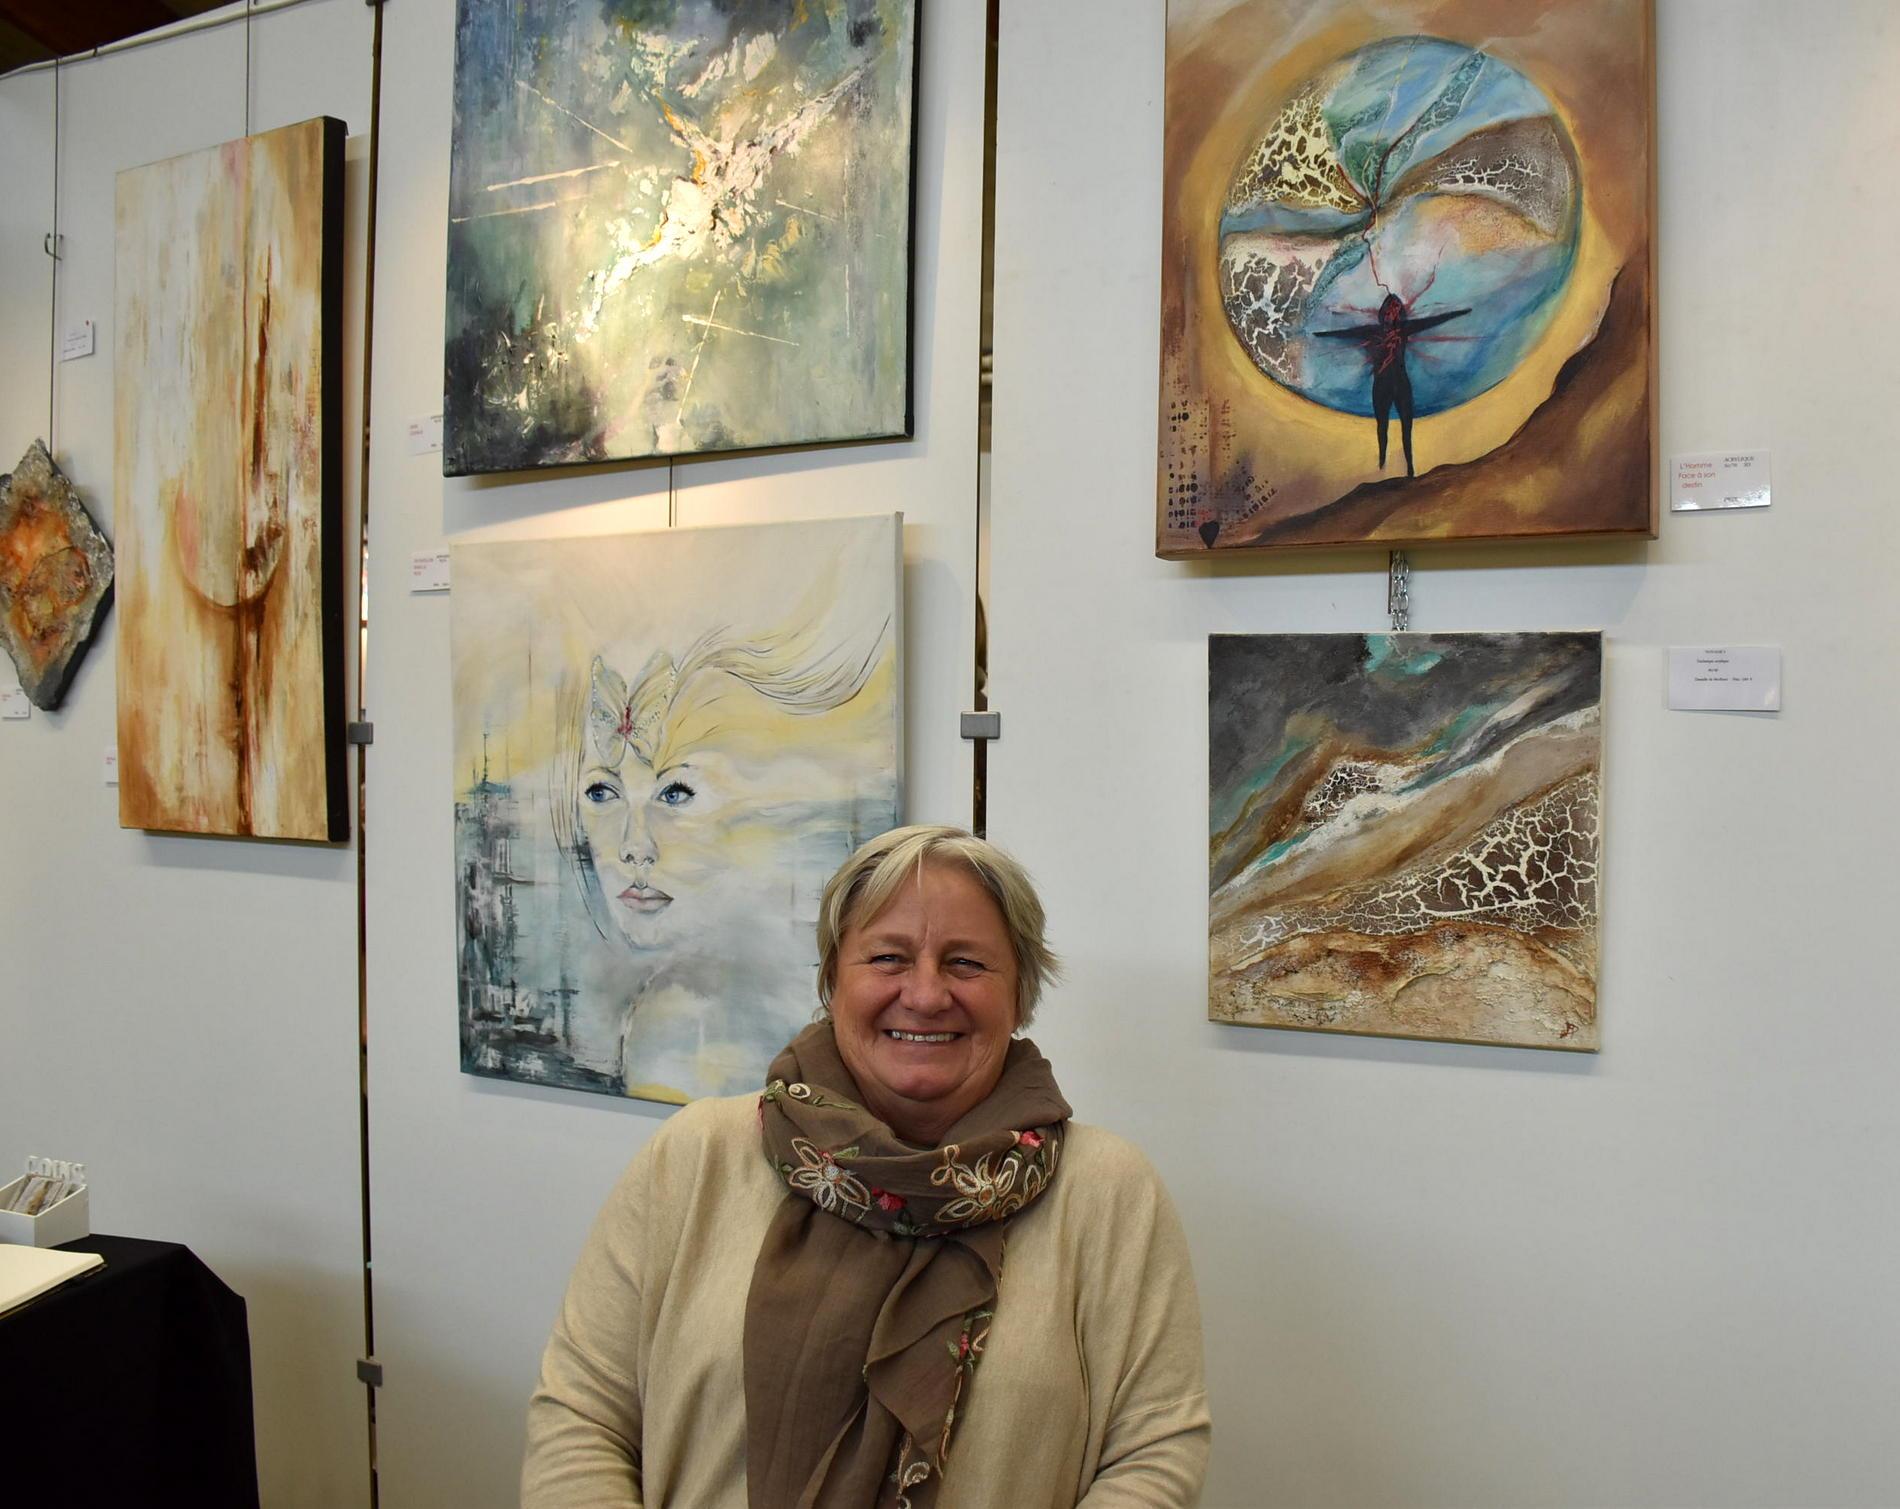 L'artiste Danielle De Moffarts